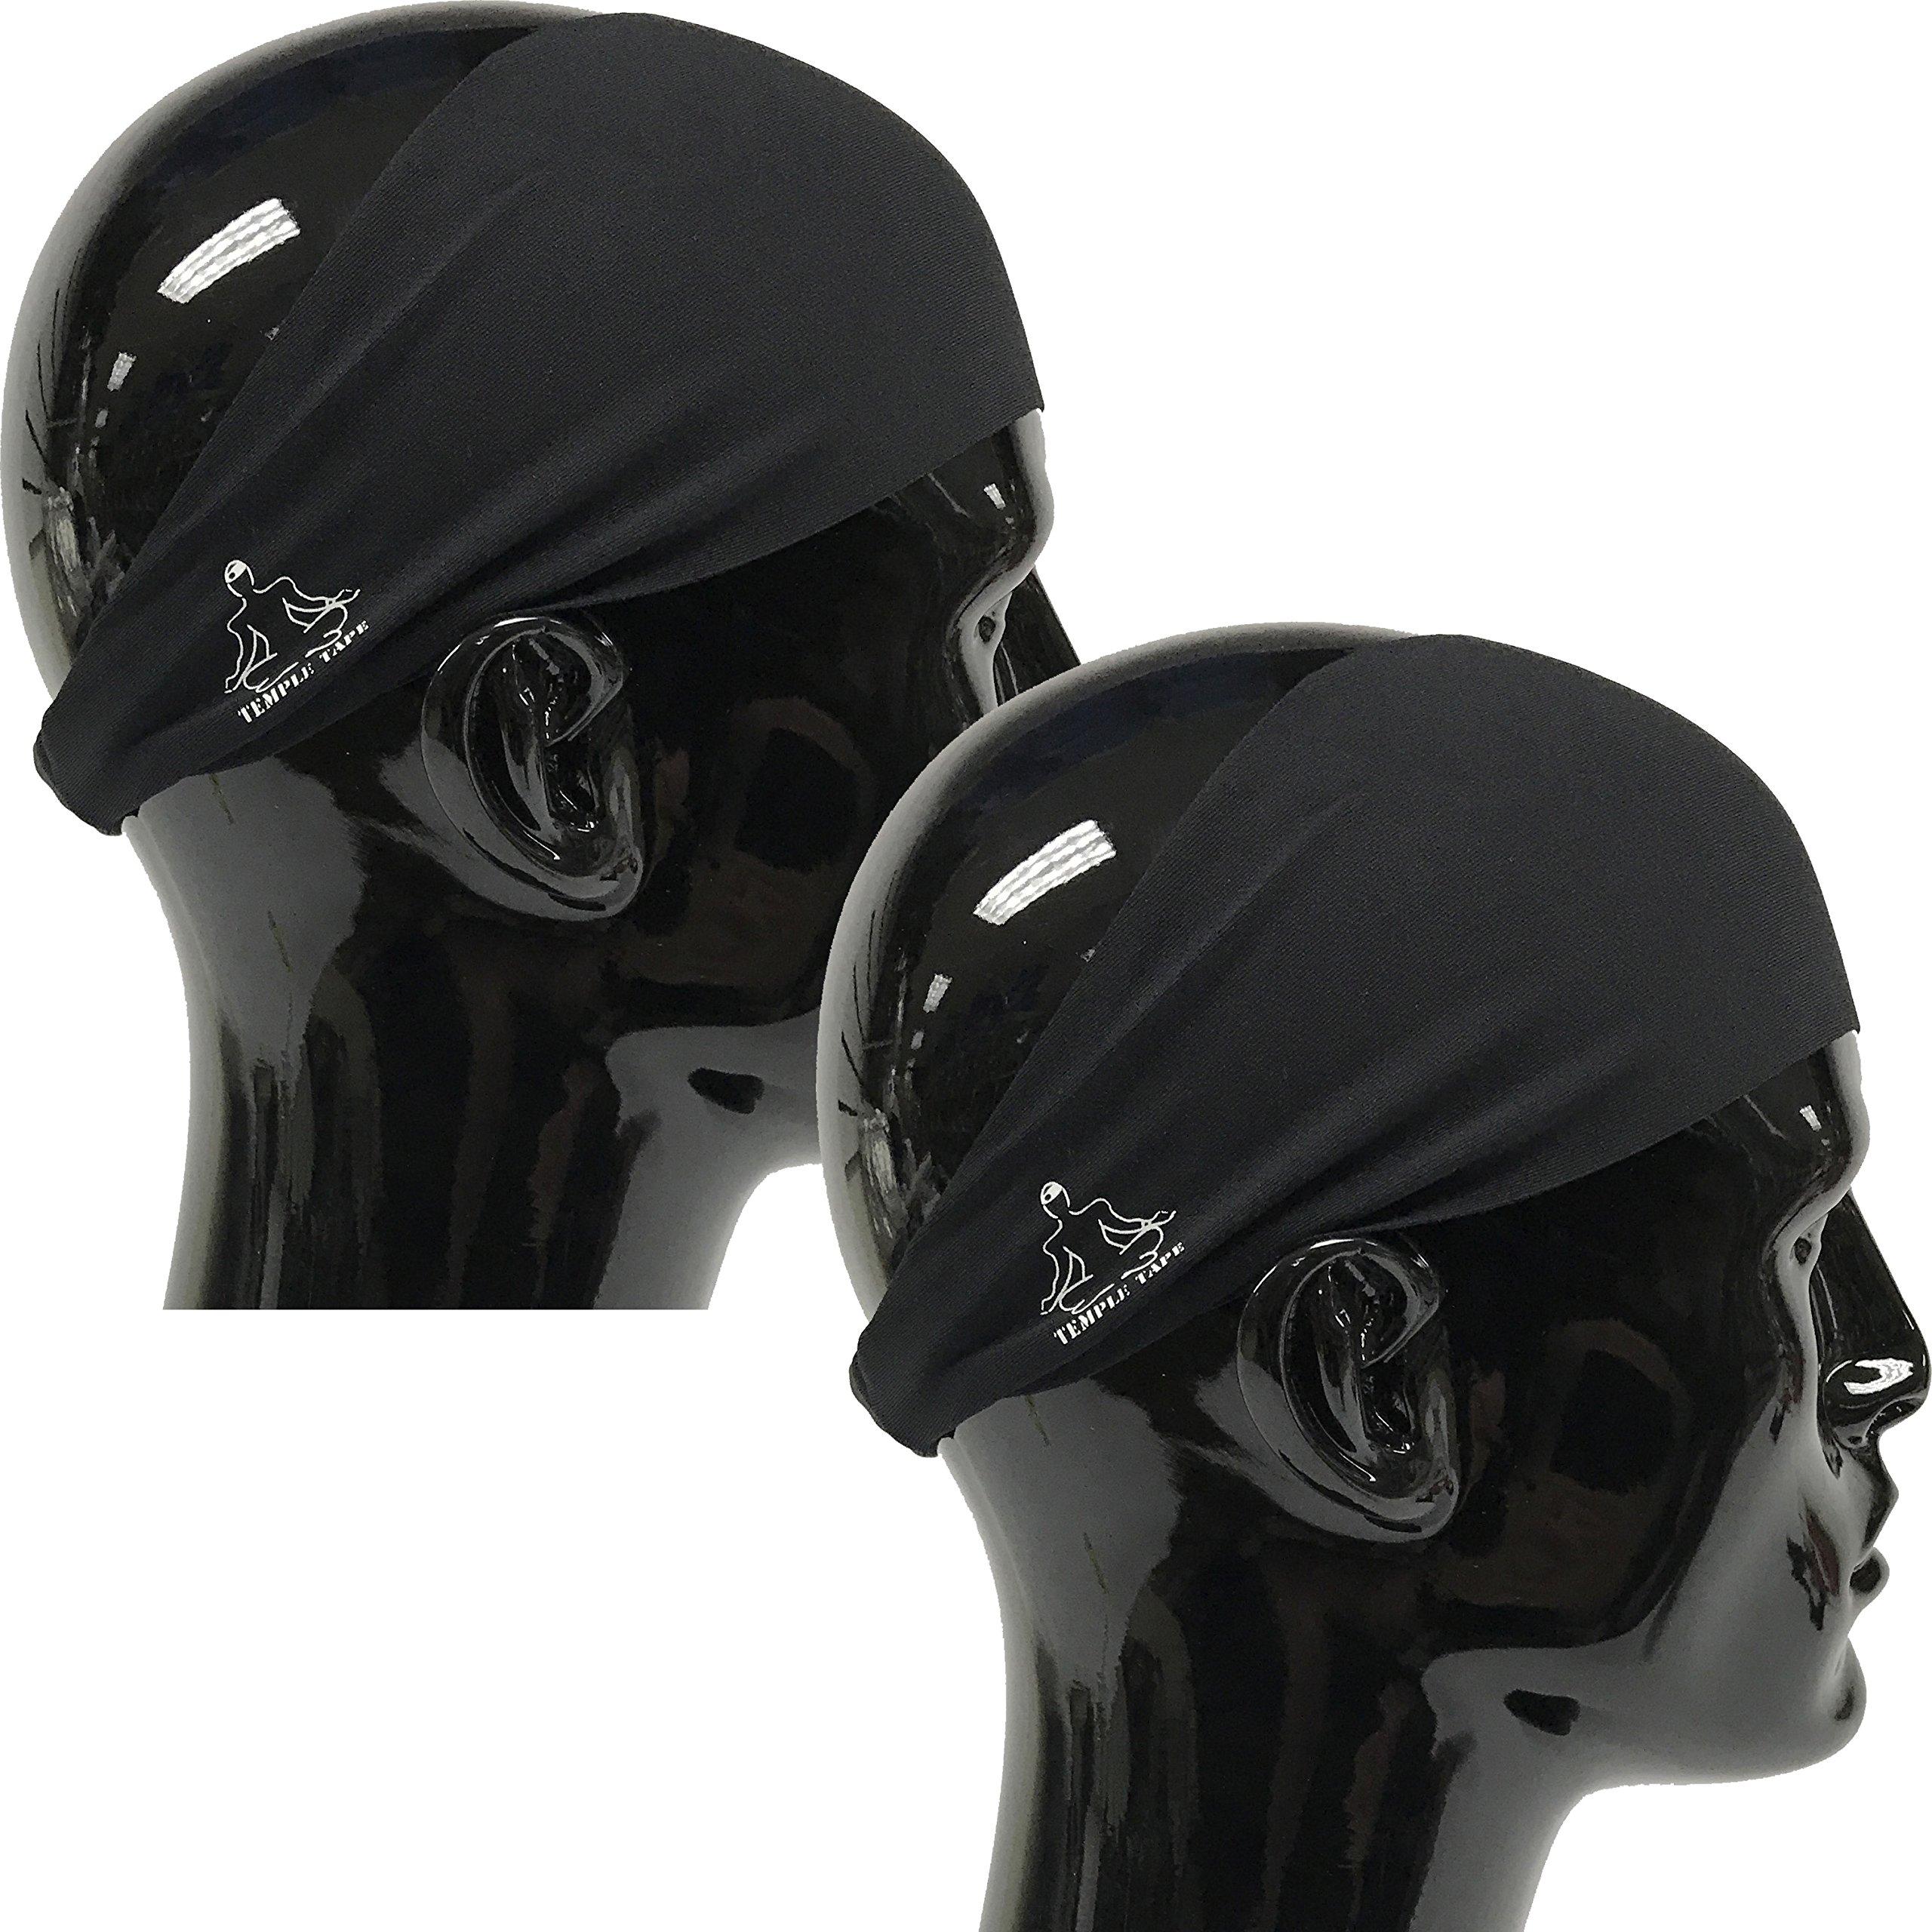 Value 2-Pack, Mens Headband - Guys Sweatband & Sports Headbands Moisture Wicking Workout Sweatbands for Running, Cross-Train, Skiing and bike helmet friendly - Value Pack - 2-Black Sweatbands - 2 Pack by Temple Tape